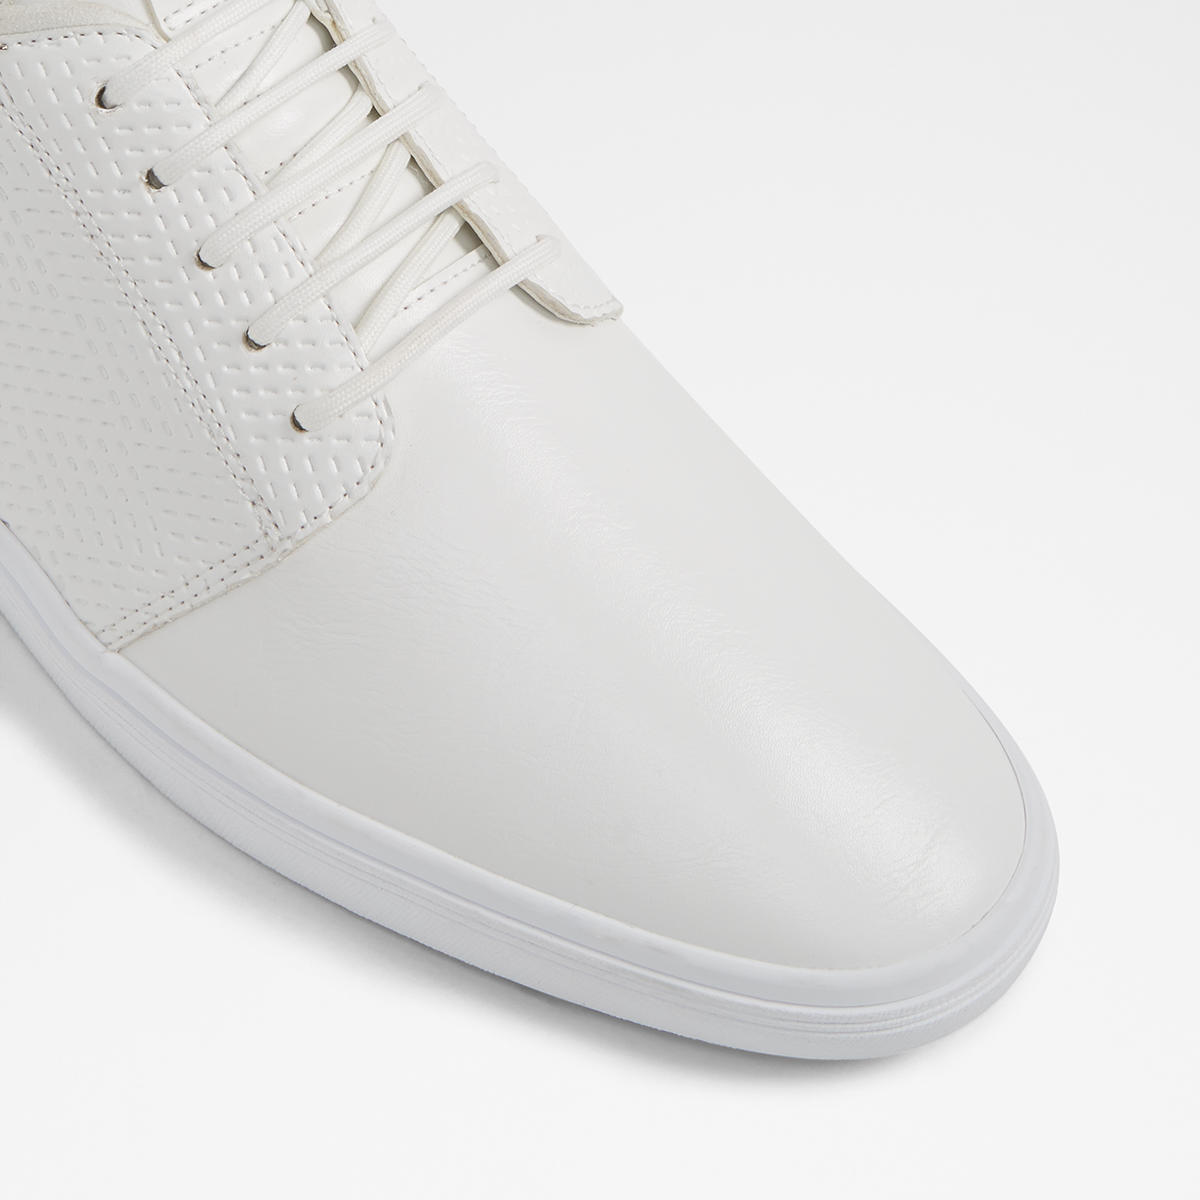 aldo shoes twitter header images follow